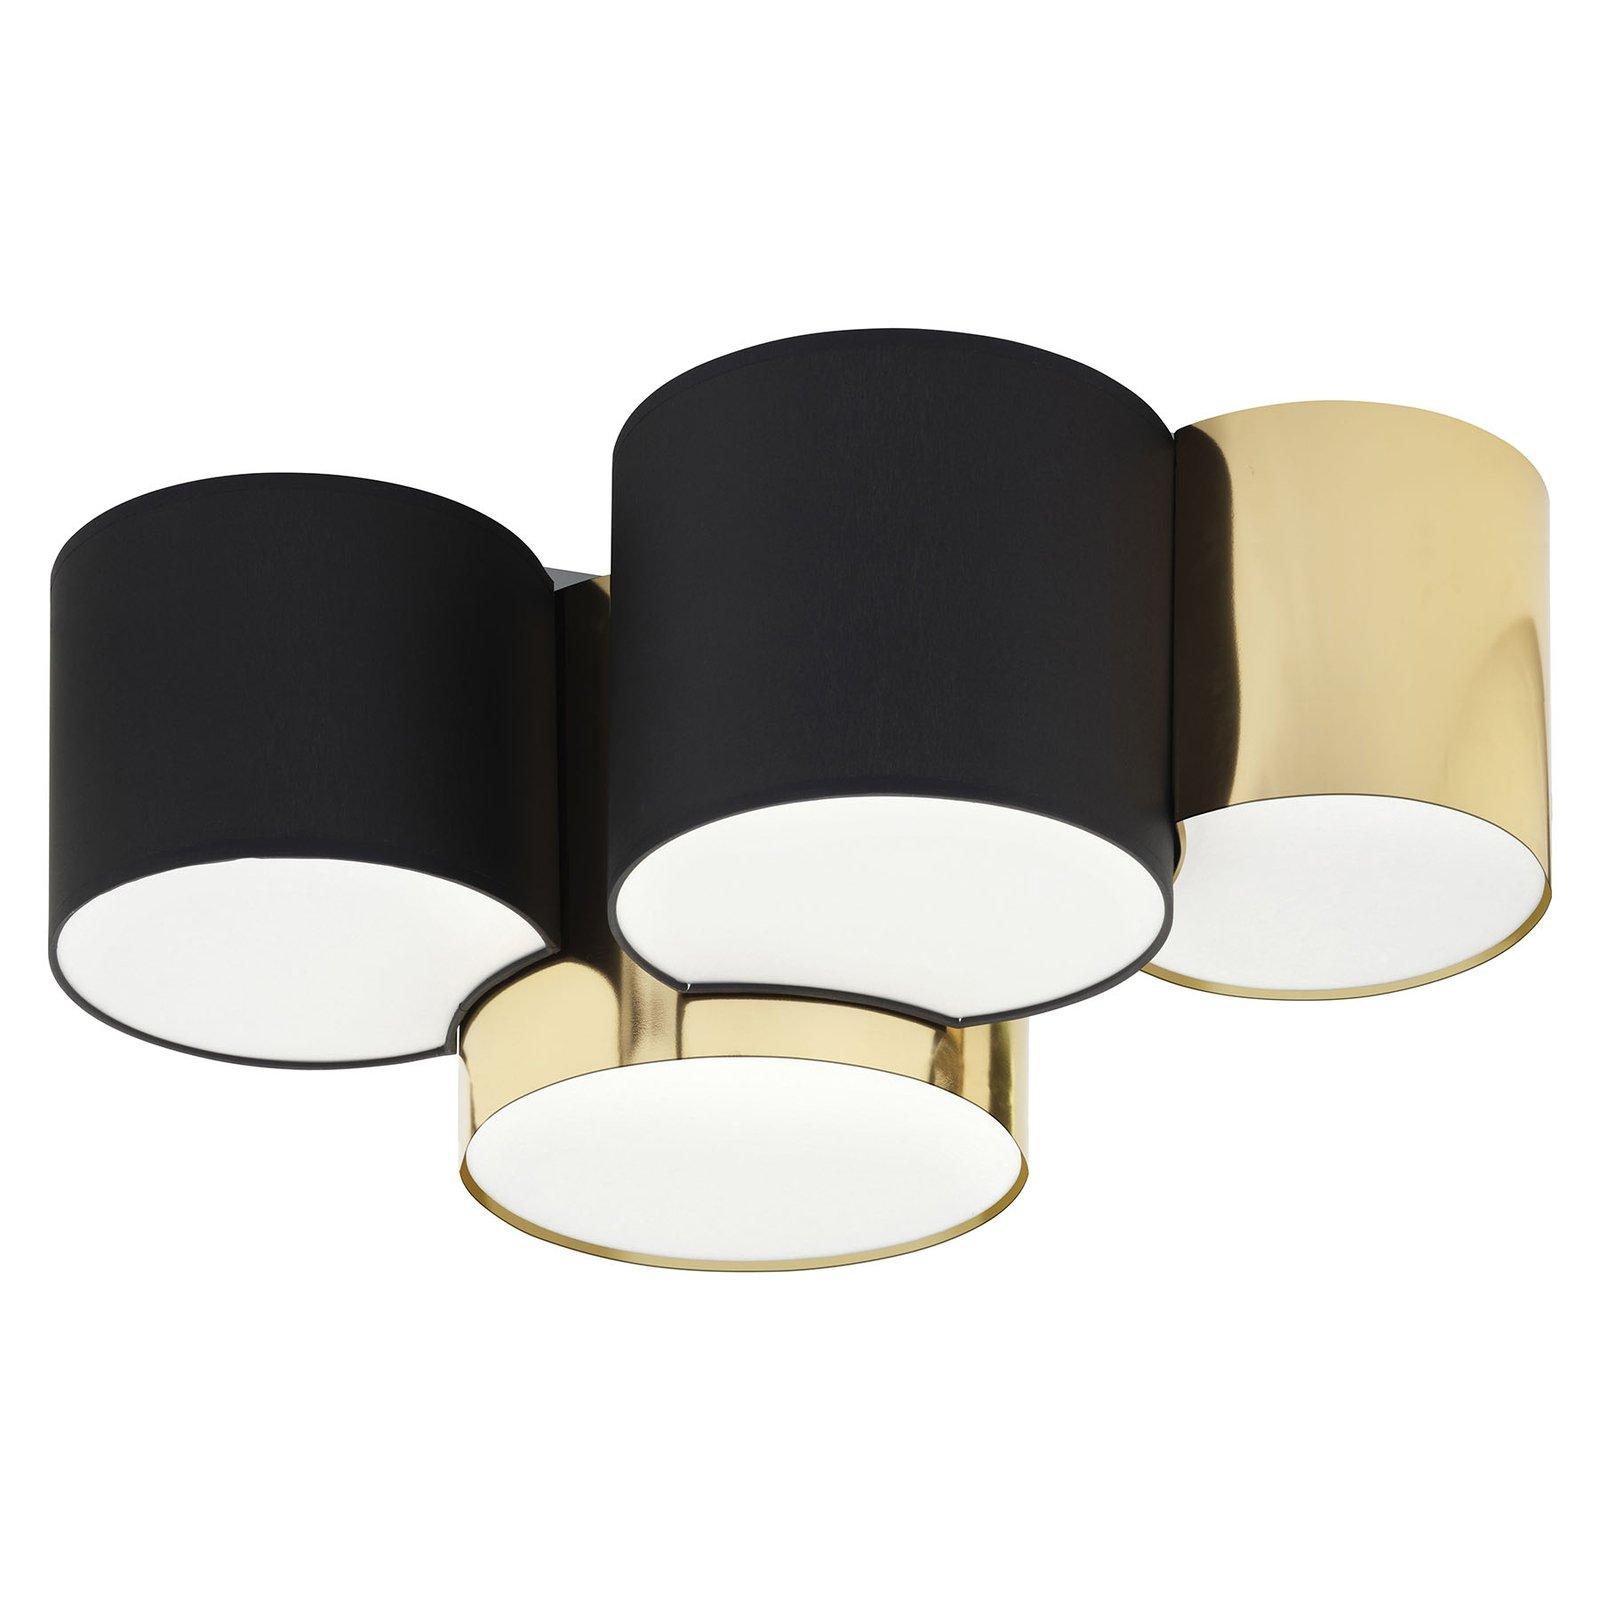 Taklampe Mona 4 lyskilder, svart/gull